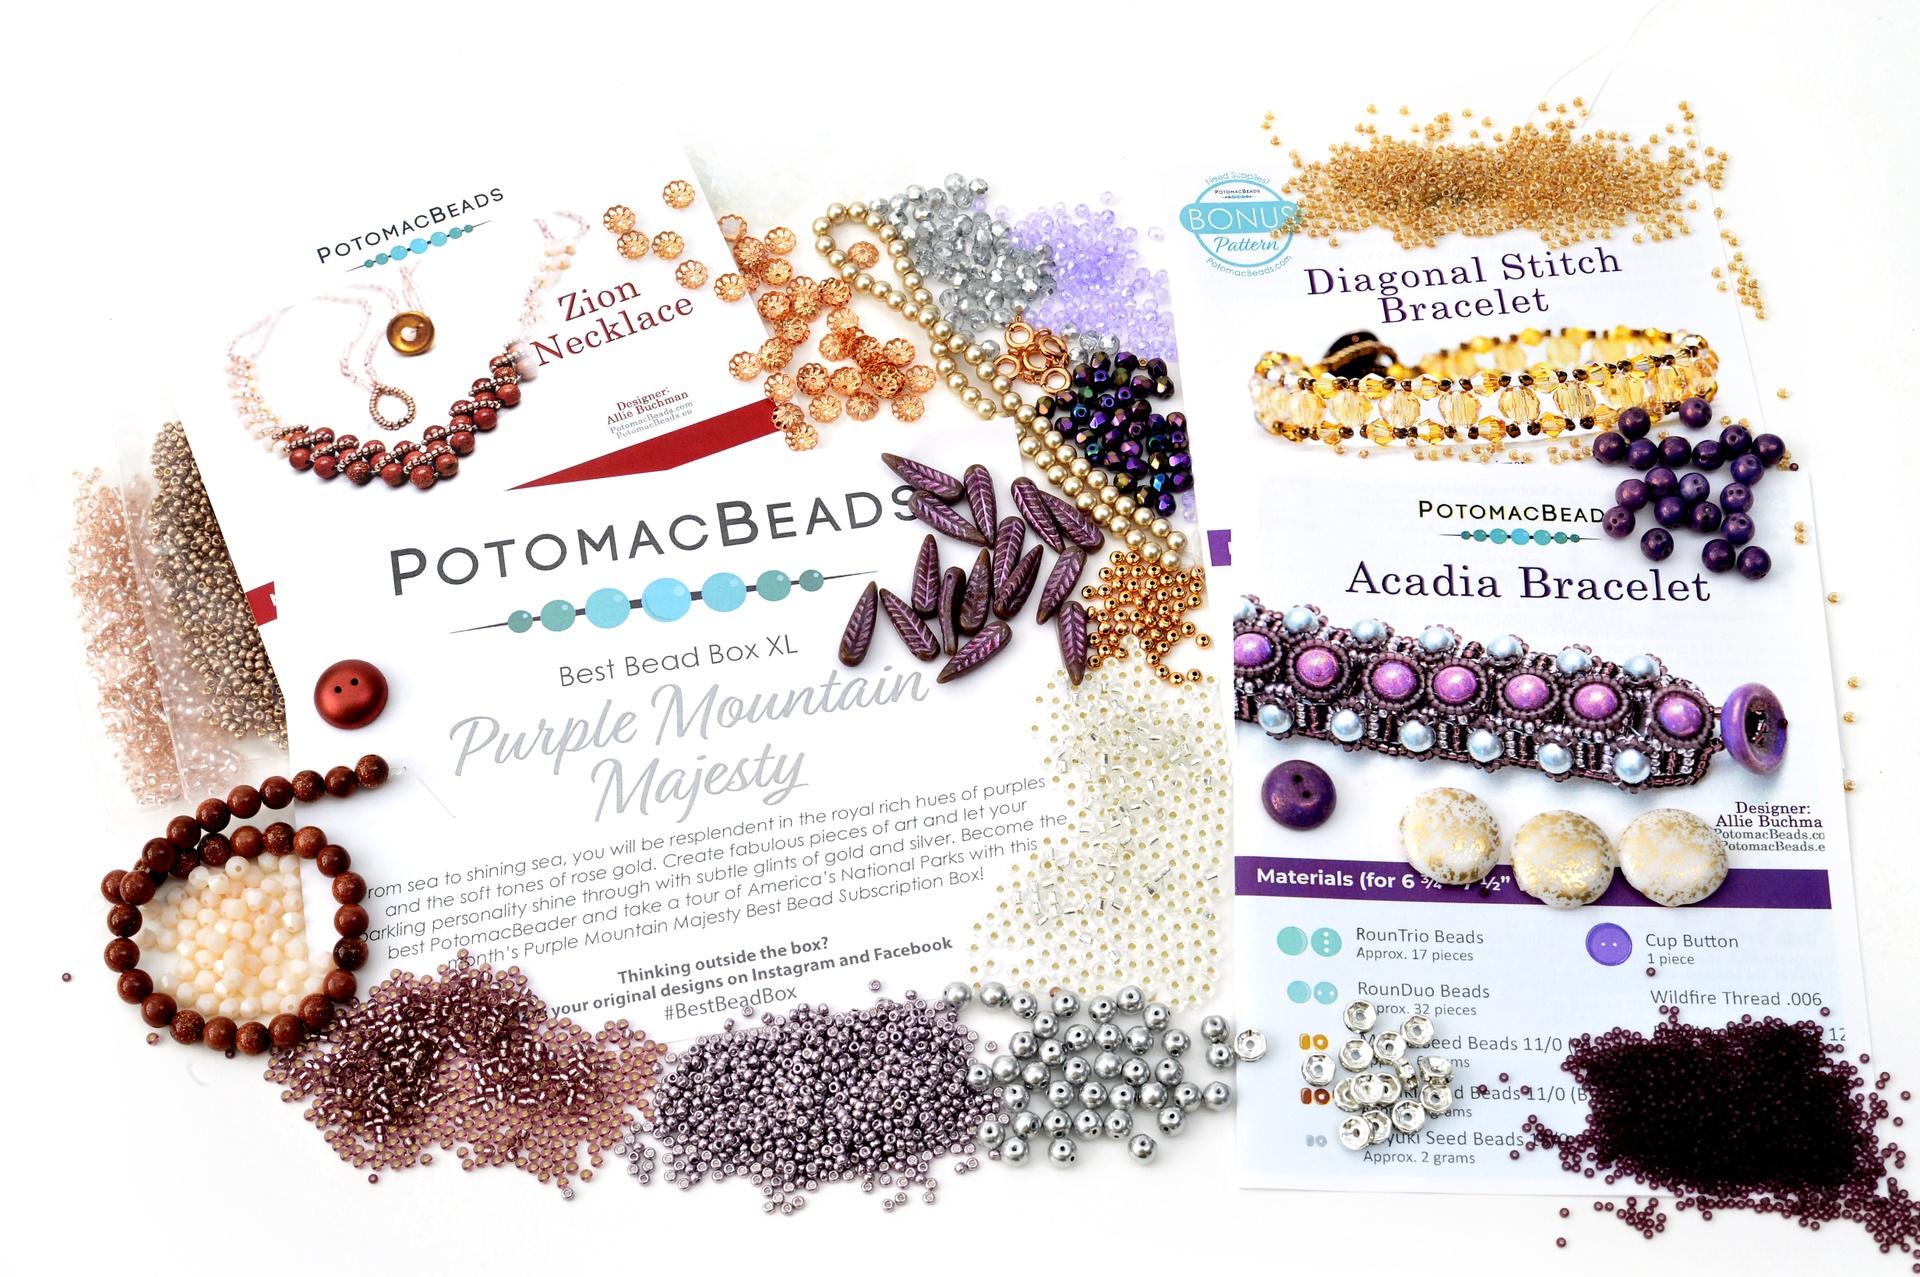 Subscription Inspiration / August Best Bead Box XL 2021